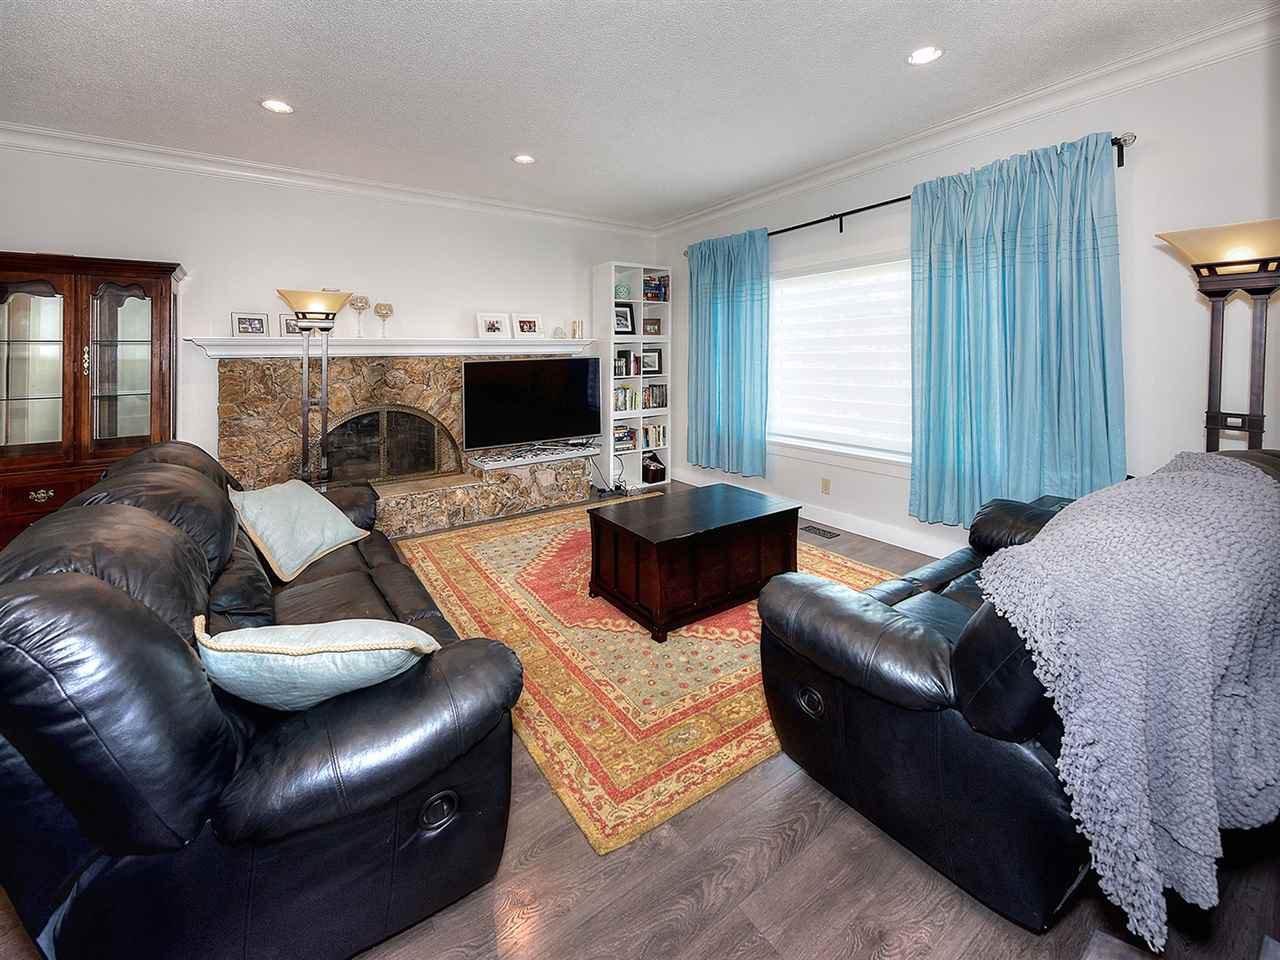 Photo 2: Photos: 1067 WILMINGTON Drive in Delta: Tsawwassen Central House for sale (Tsawwassen)  : MLS®# R2090180